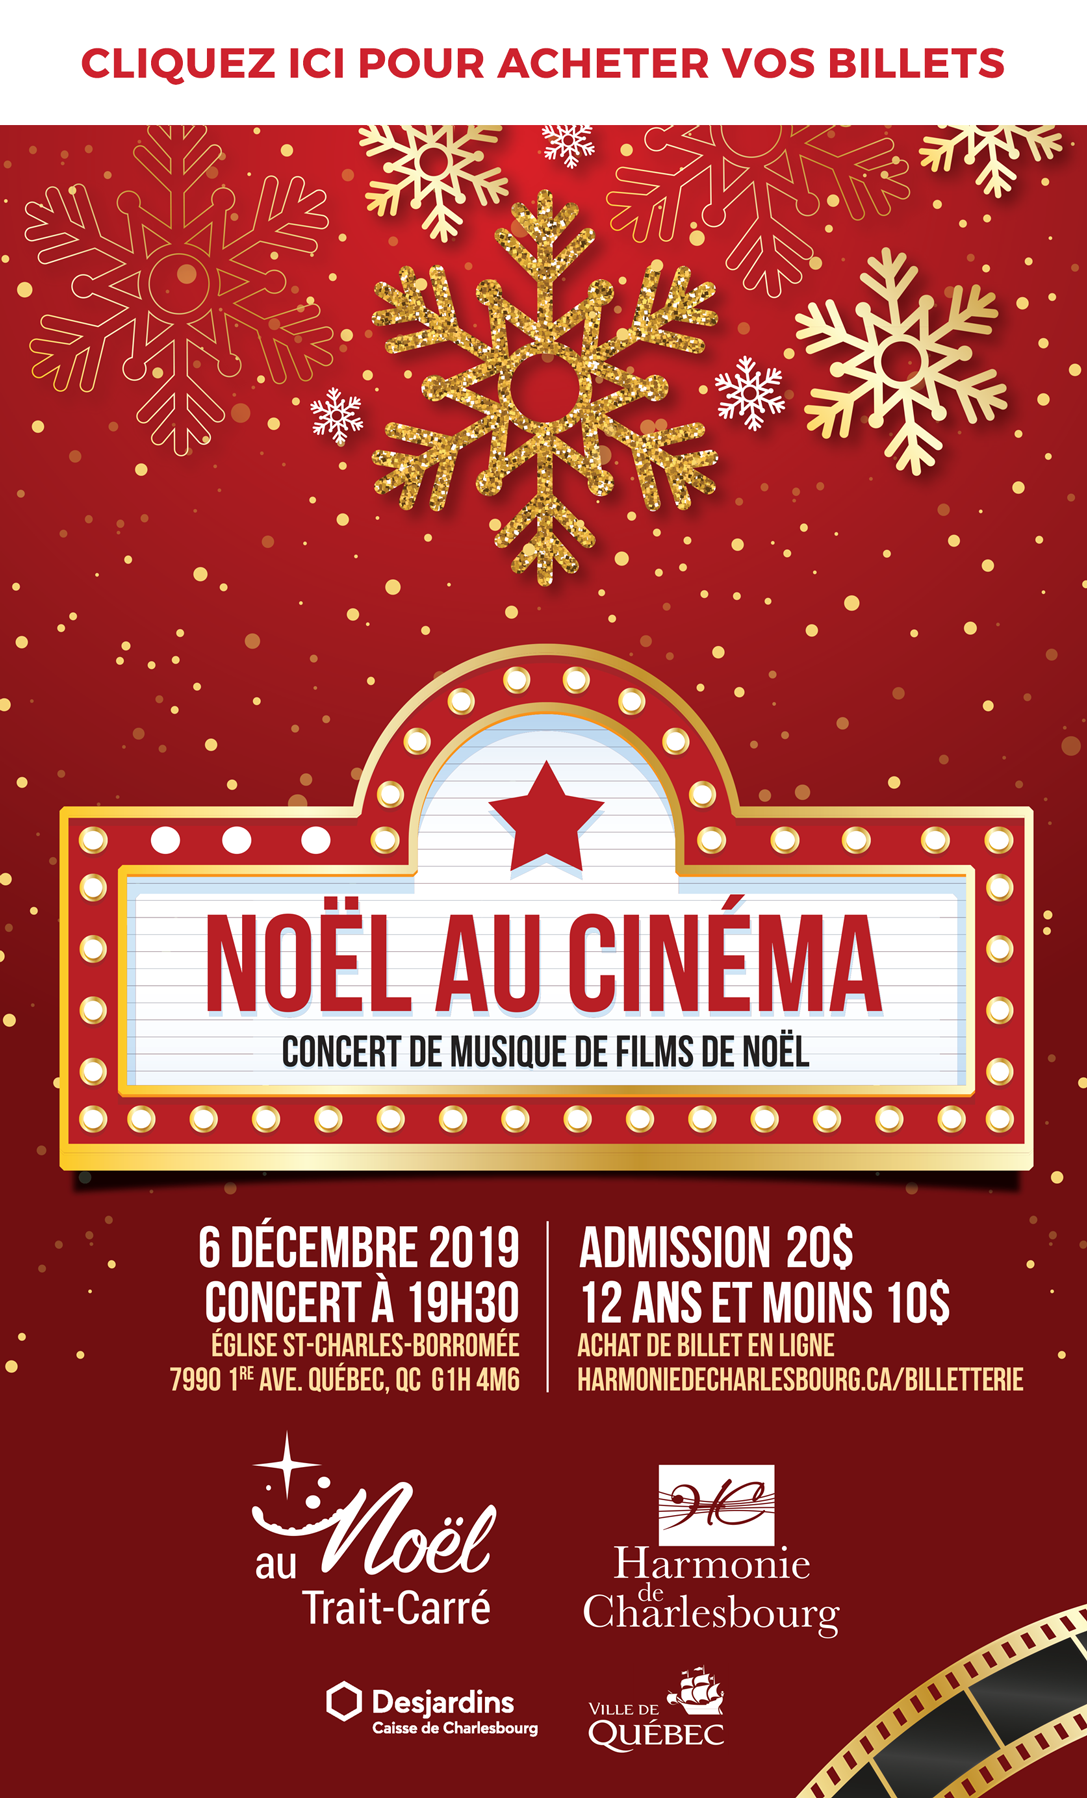 NTC-Concert-Noel-Cinema-Affiche-11x17_VF---CLIQUEZ-WEB-VF